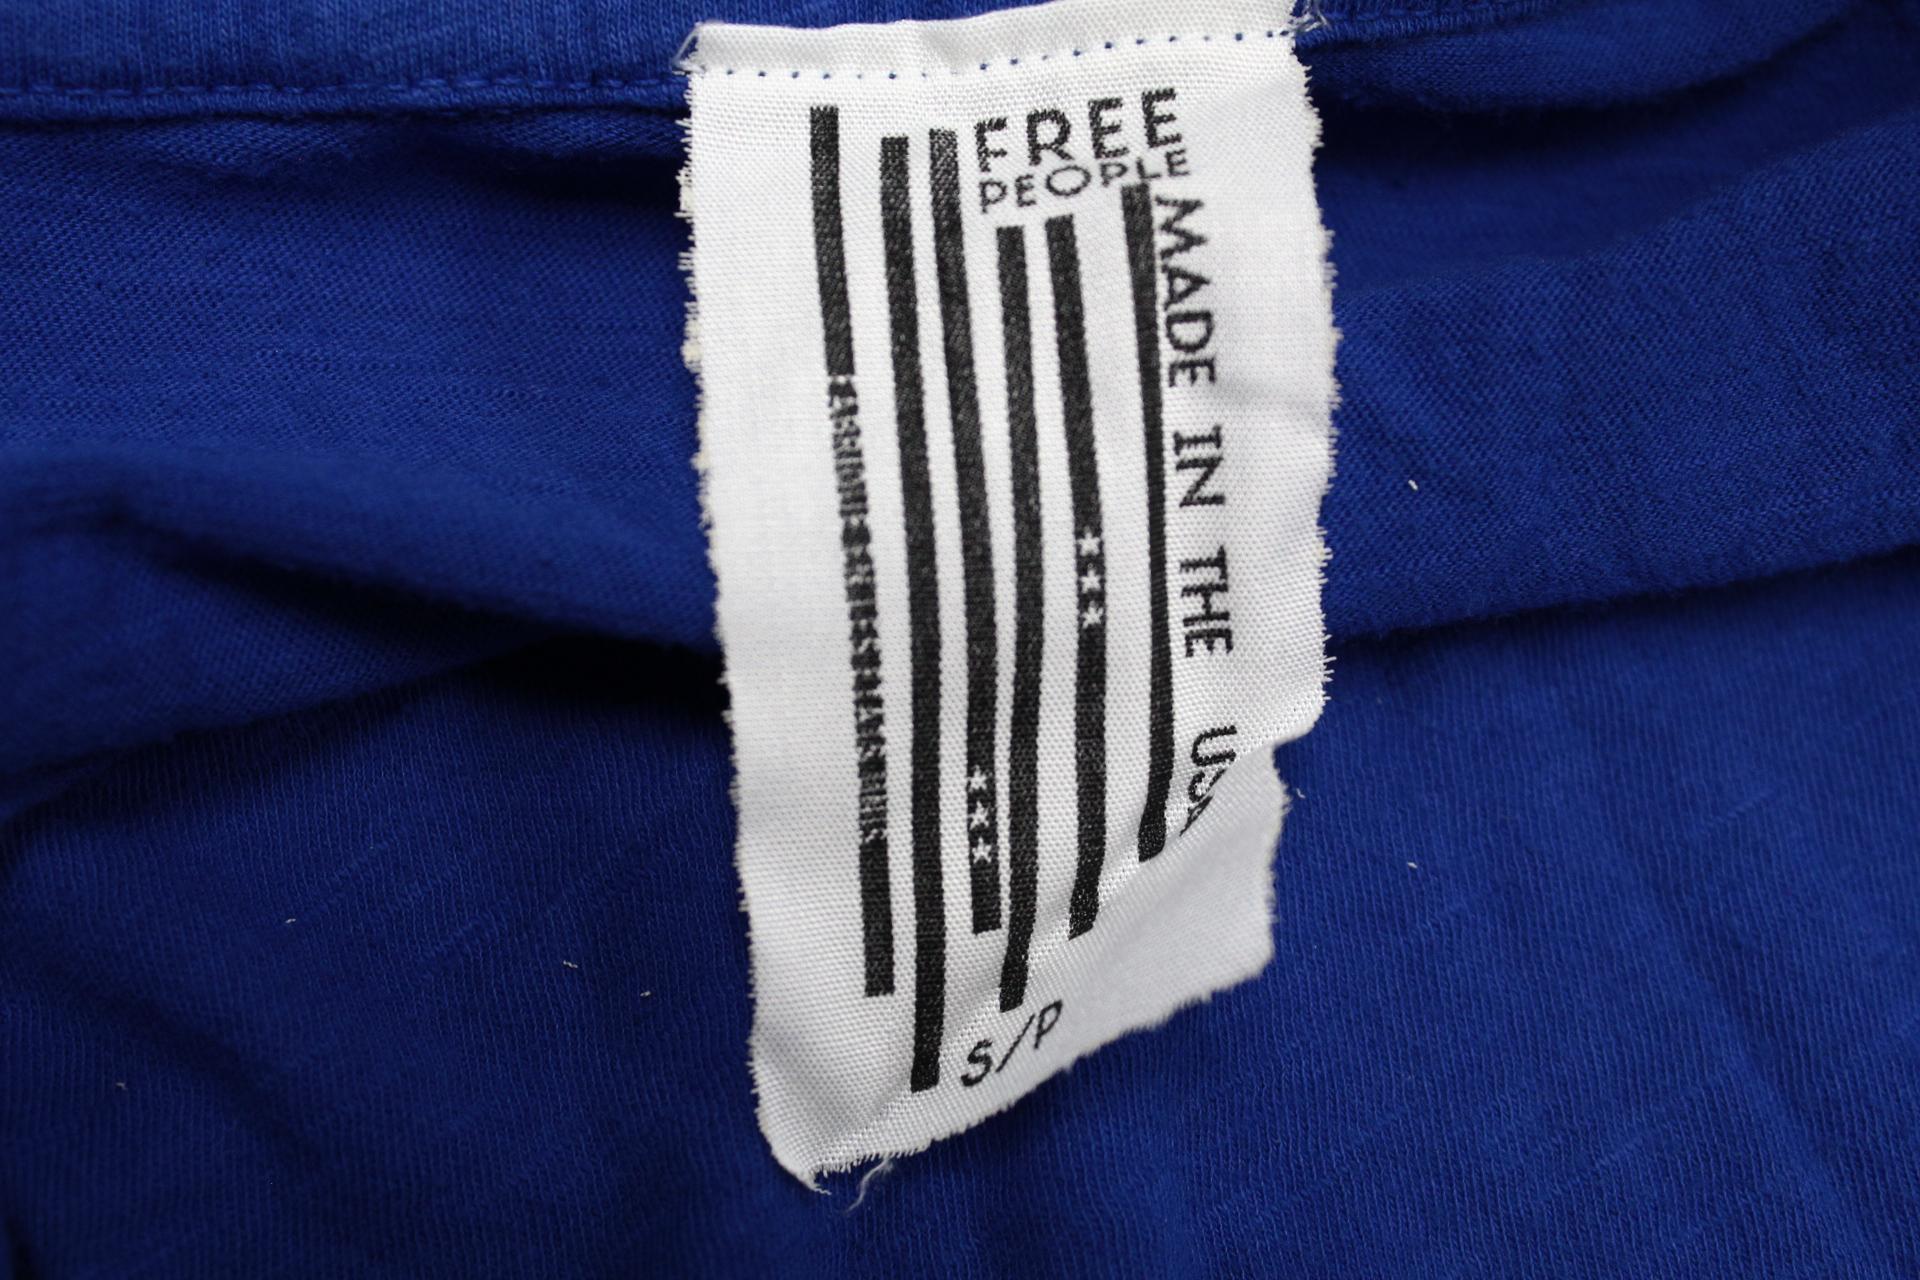 New-Free-People-Melrose-Swing-Tee-100-Cotton-Hi-Lo-Trapeze-Top-Womens-Xs-L-68 thumbnail 4